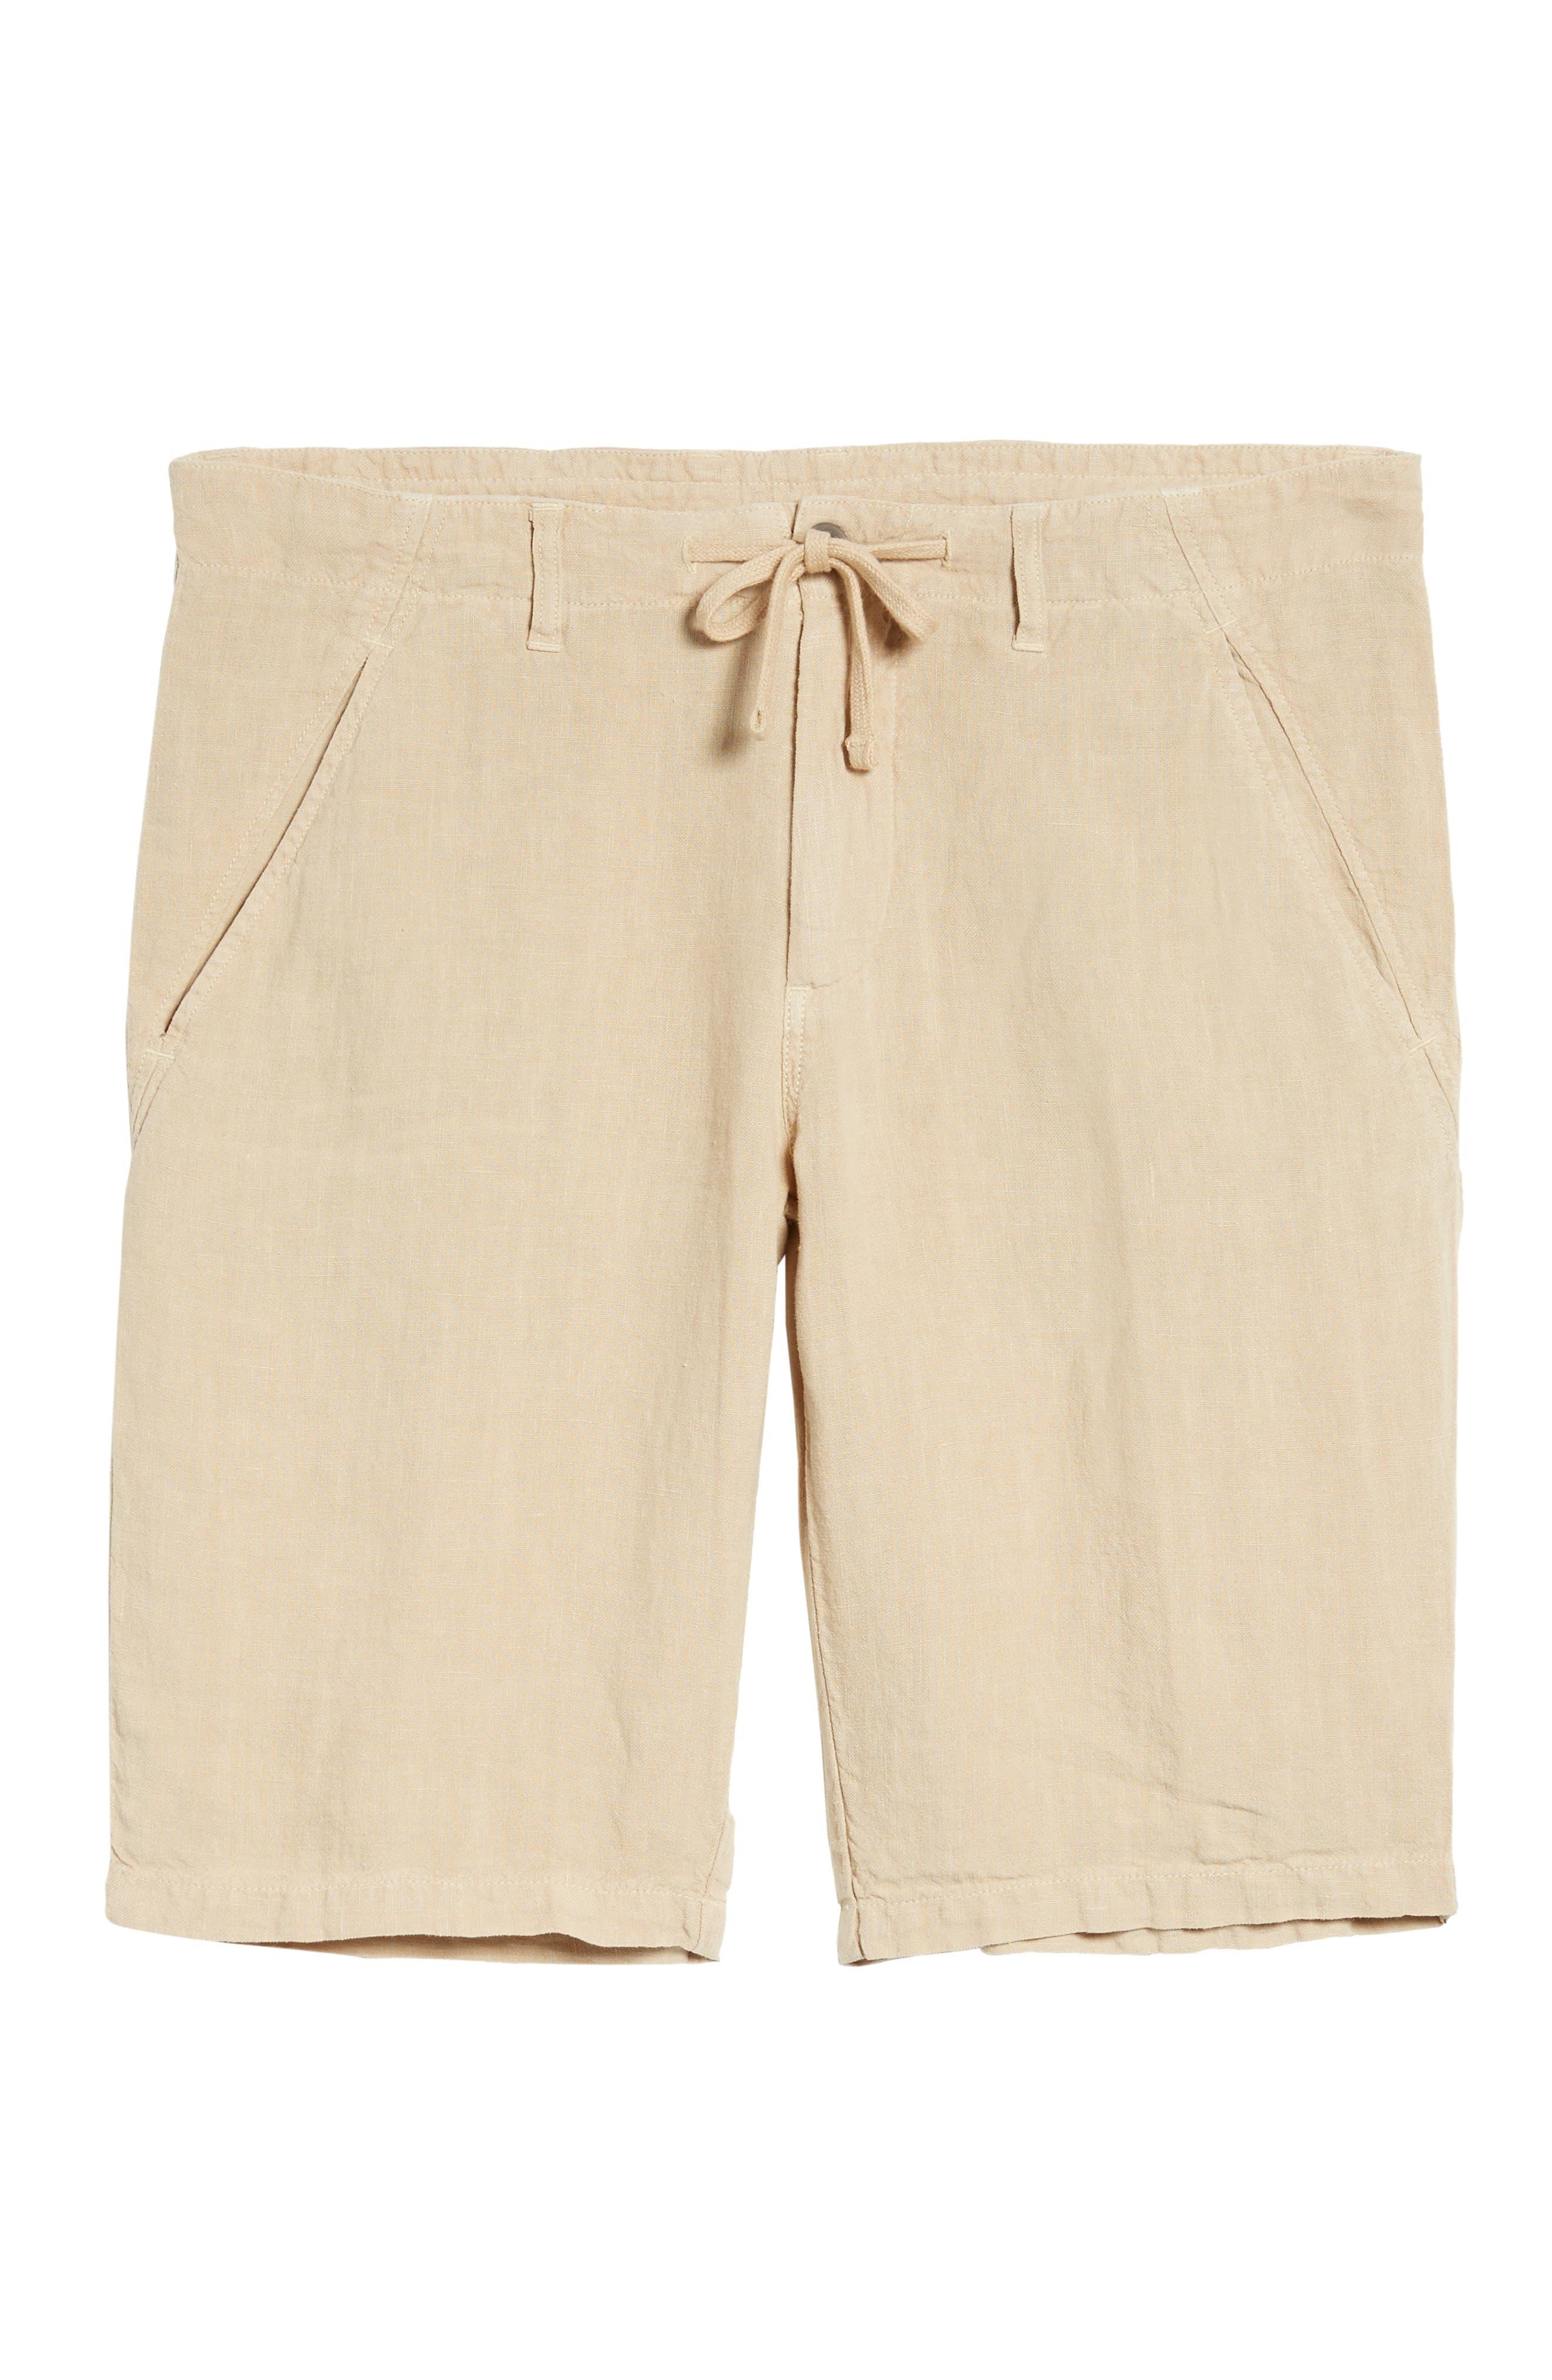 & Bros. Linen Shorts,                             Alternate thumbnail 6, color,                             200